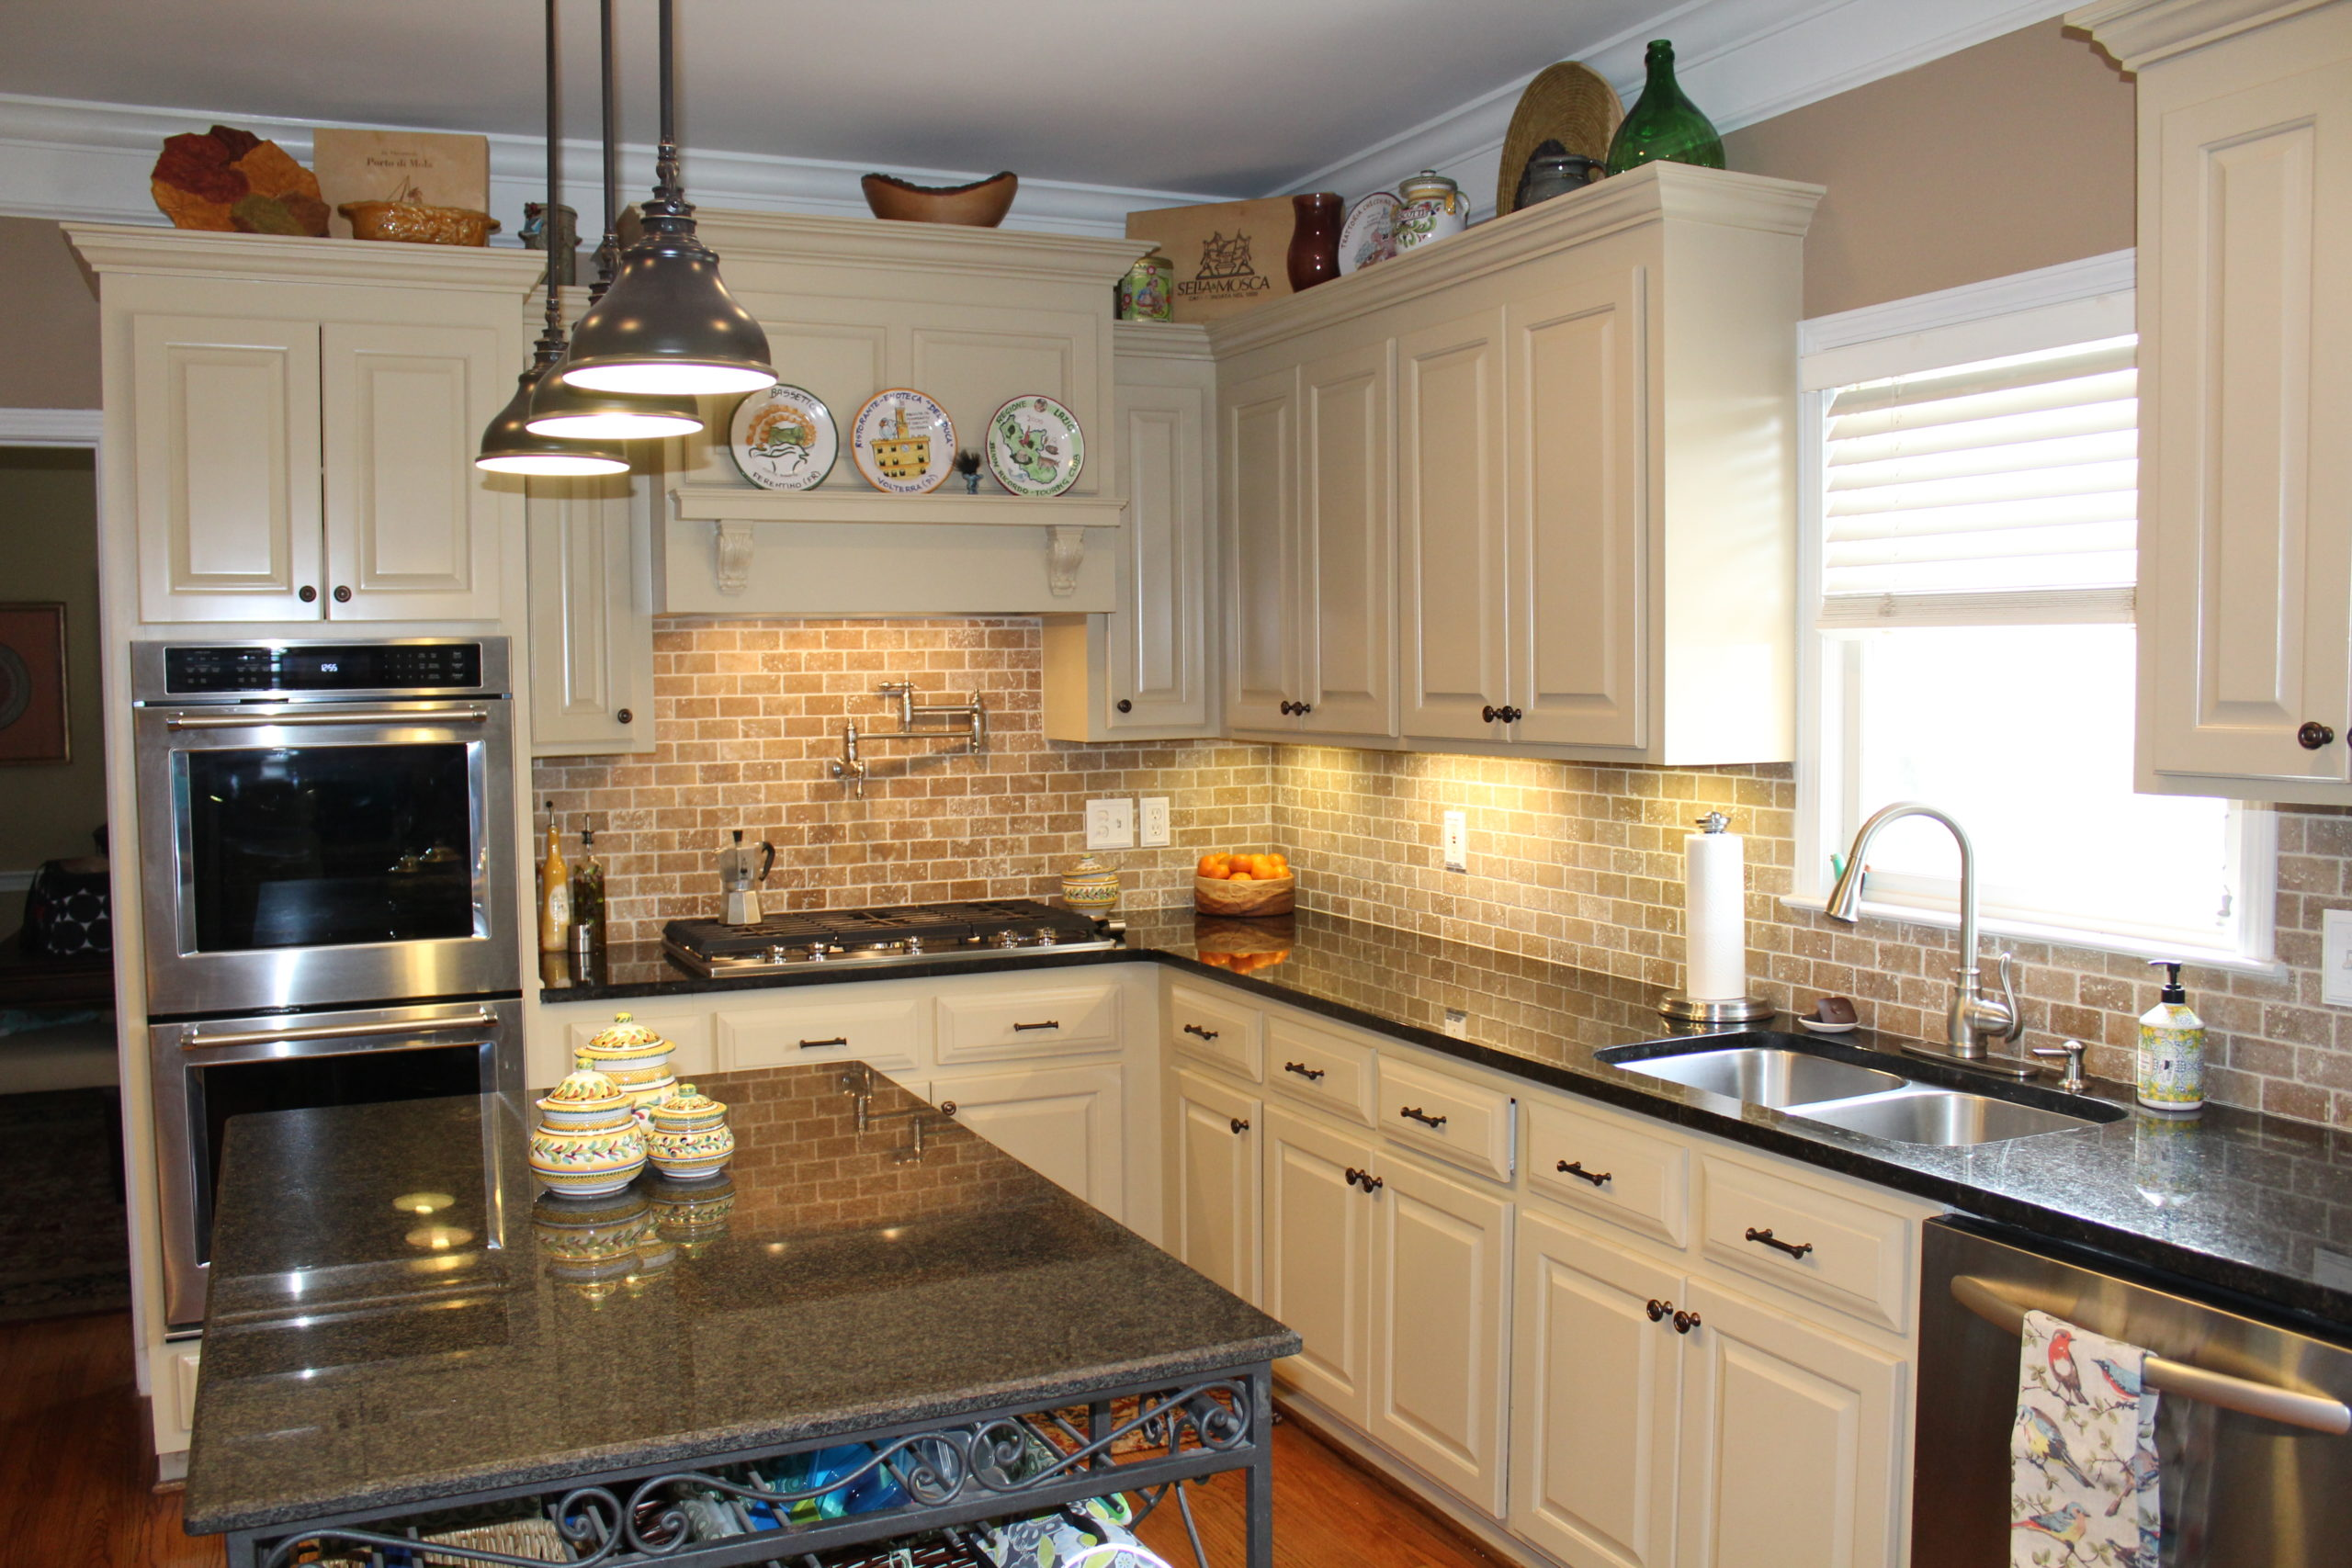 kitchen-remodeling-work-TAG-Builder-308-BC-Kitchen-Remodel-1-scaled